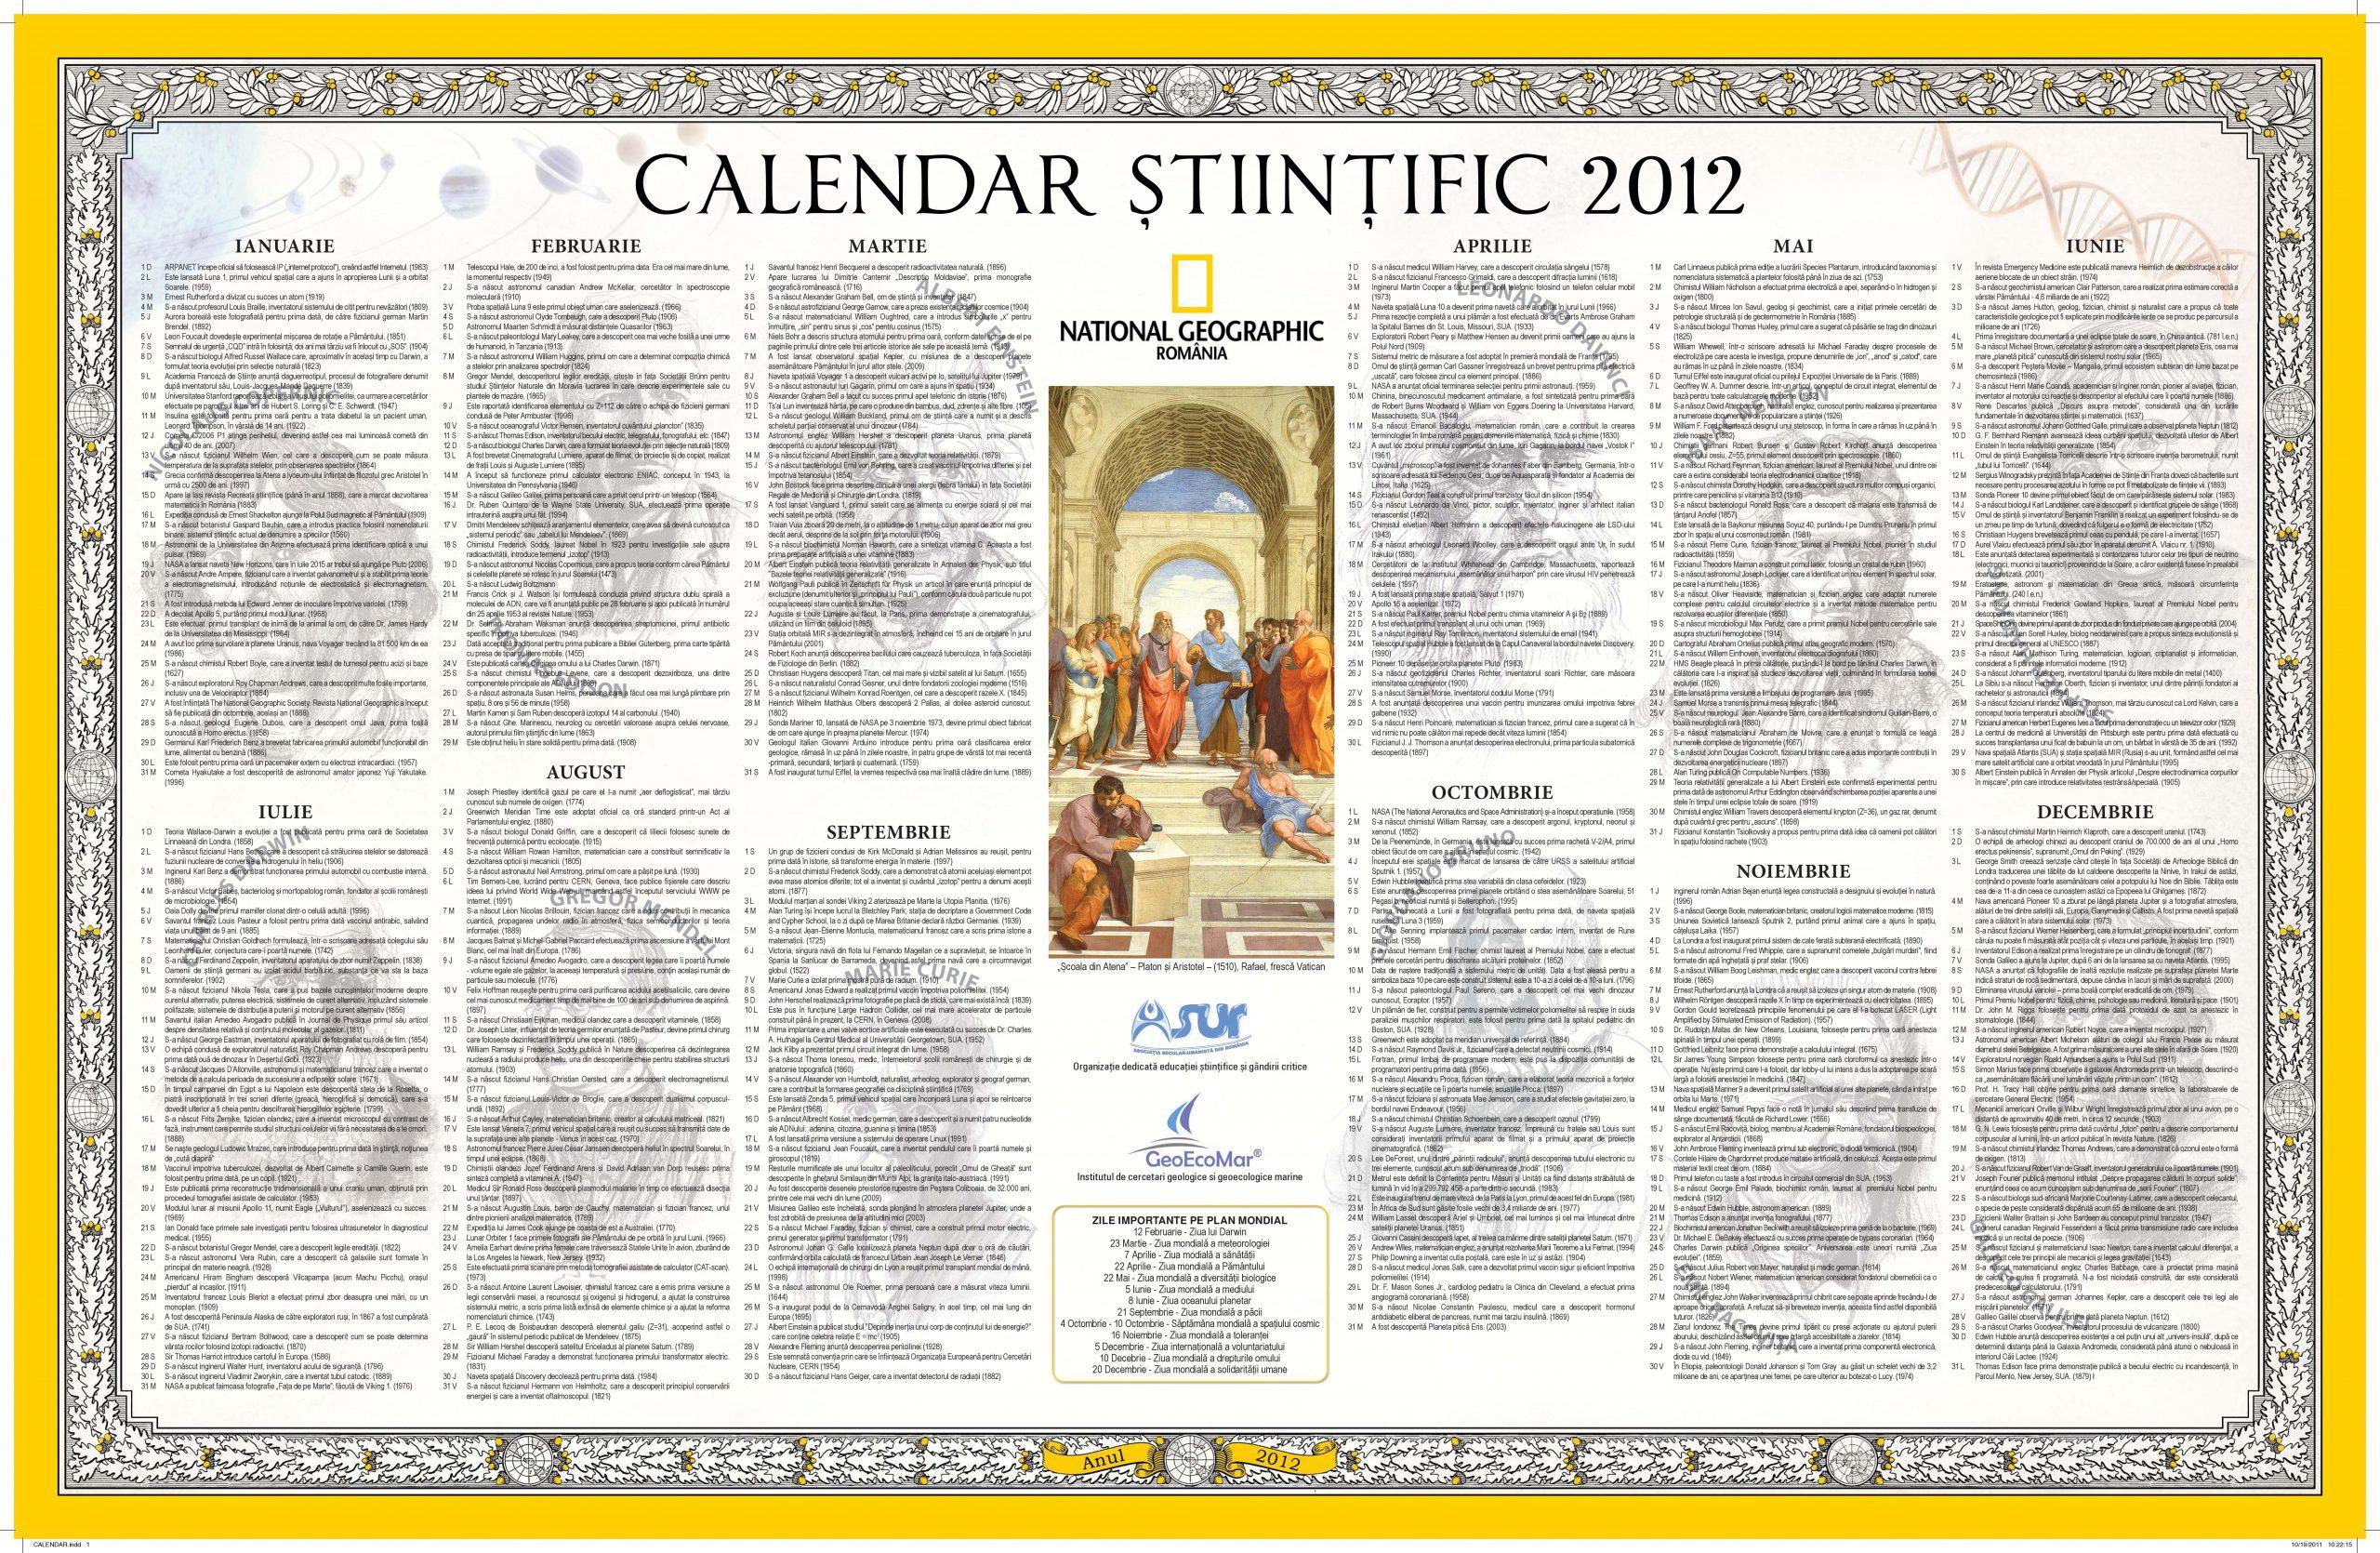 calendar stiintific 2012